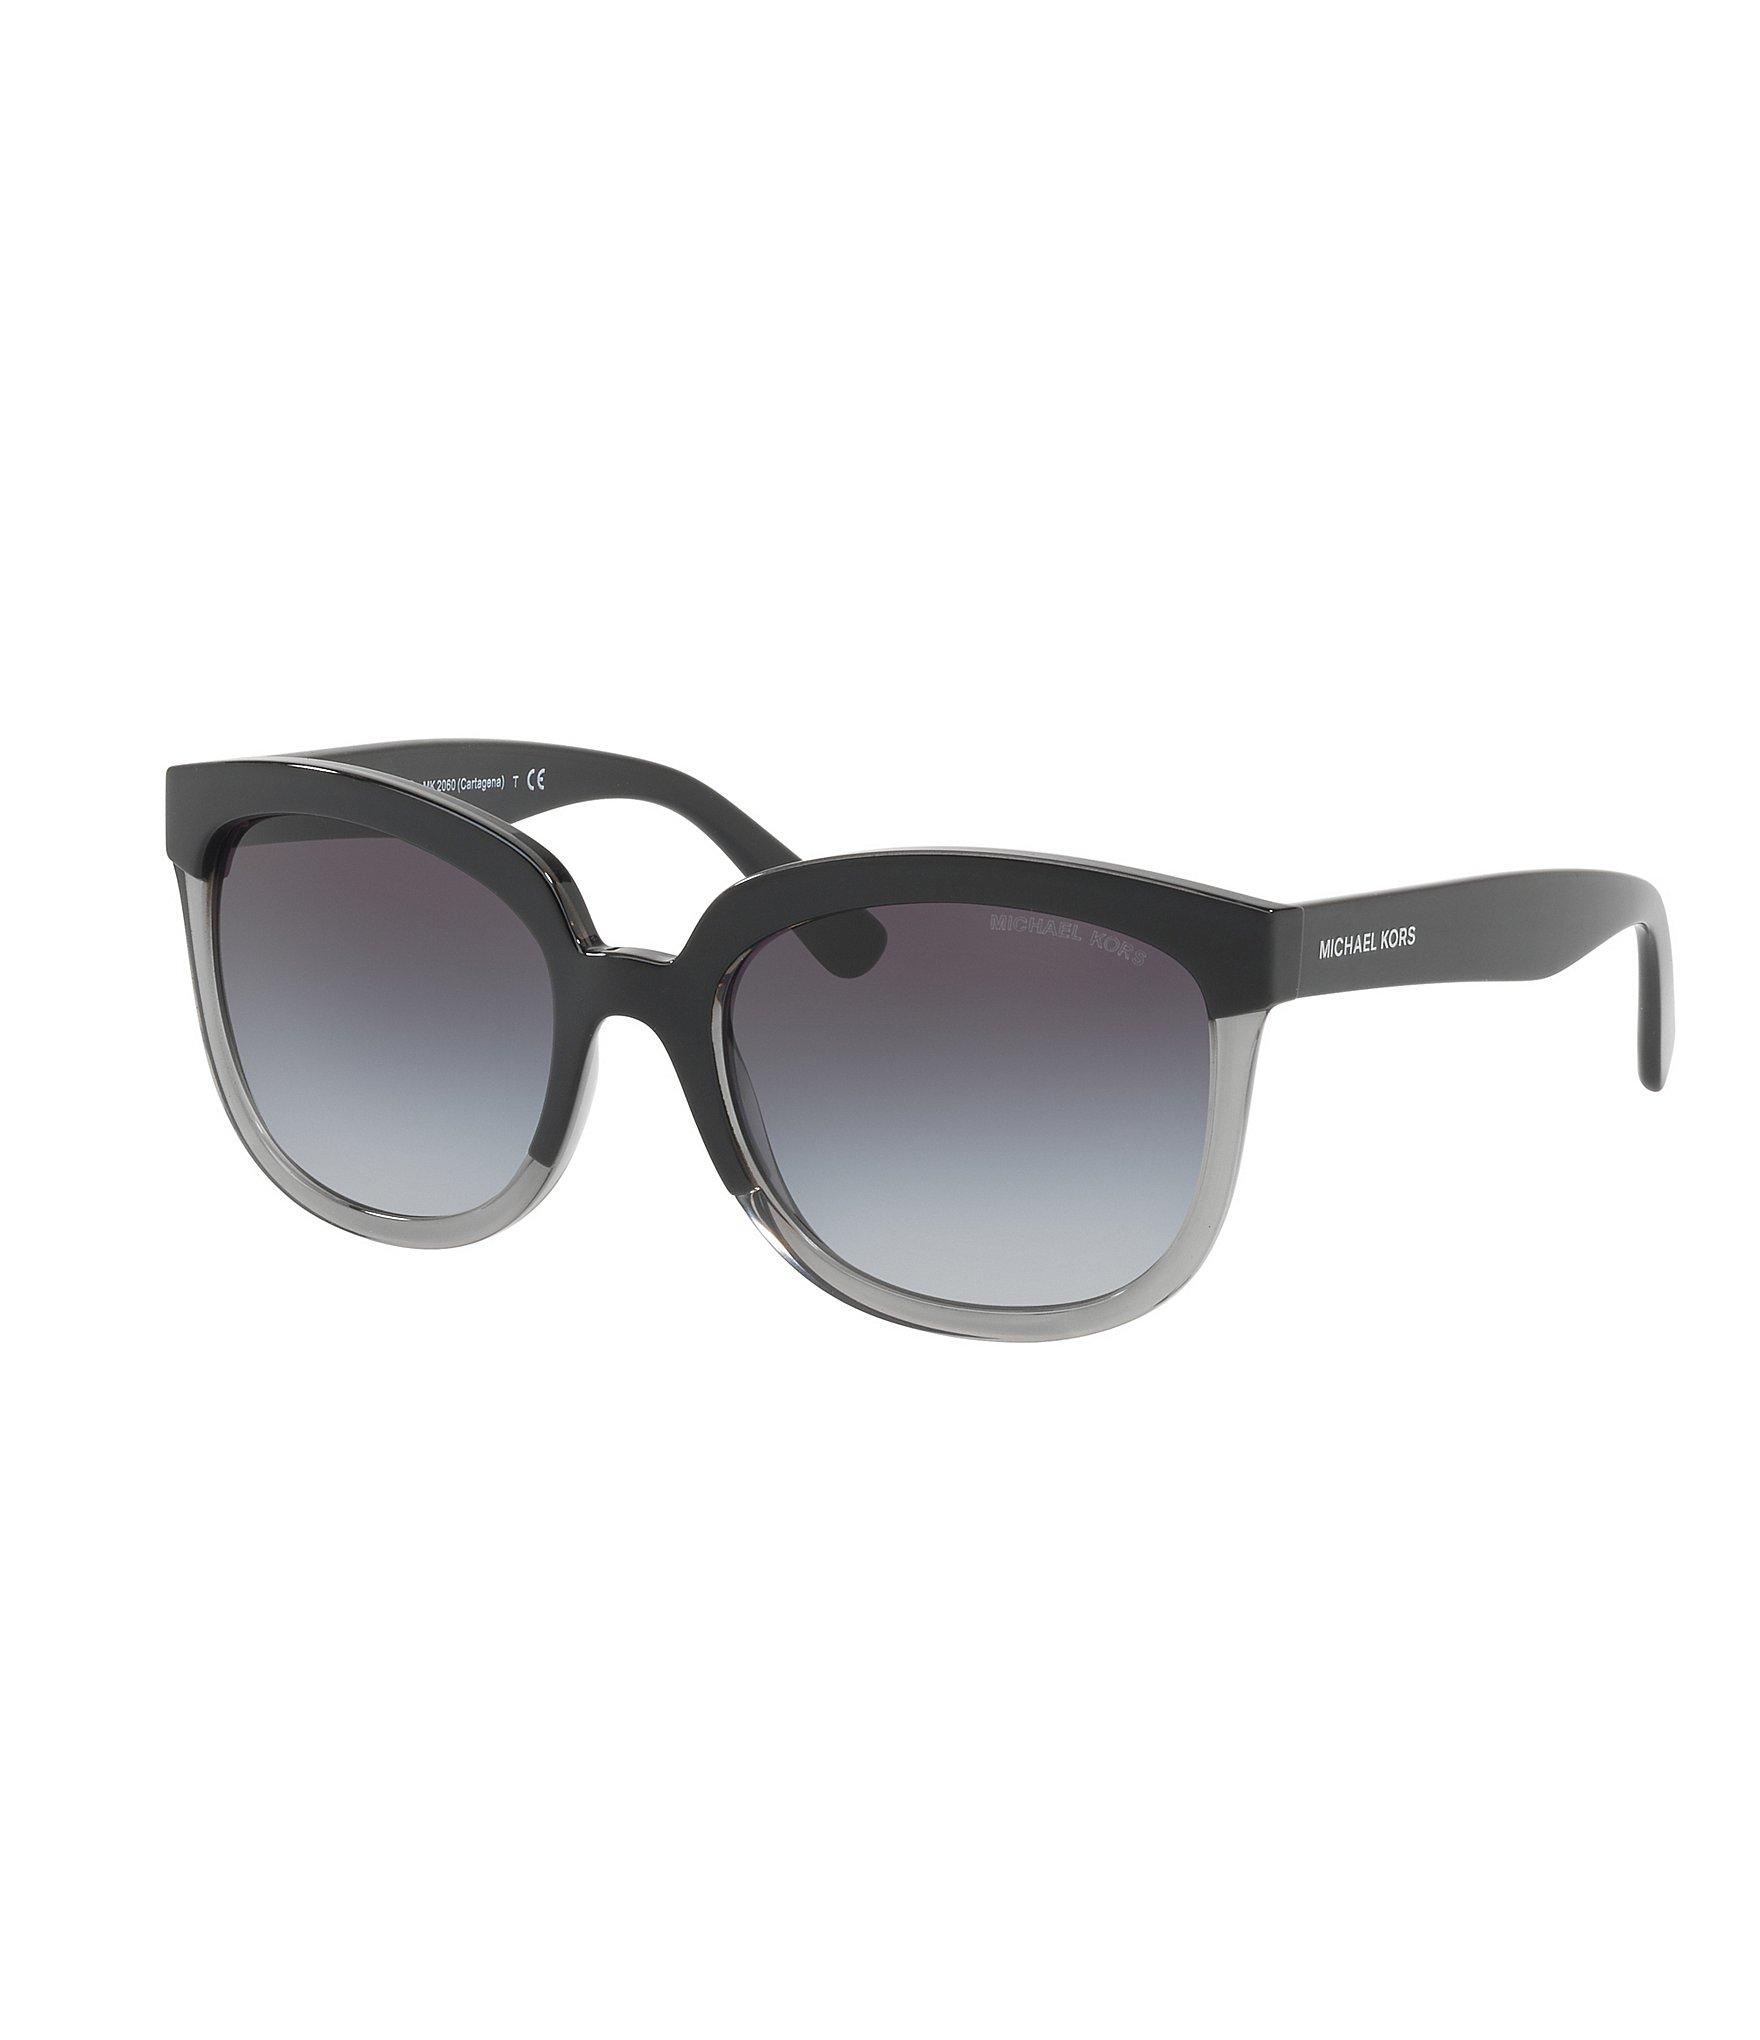 Michael kors palma gradient square sunglasses dillards - Kidshome palma ...